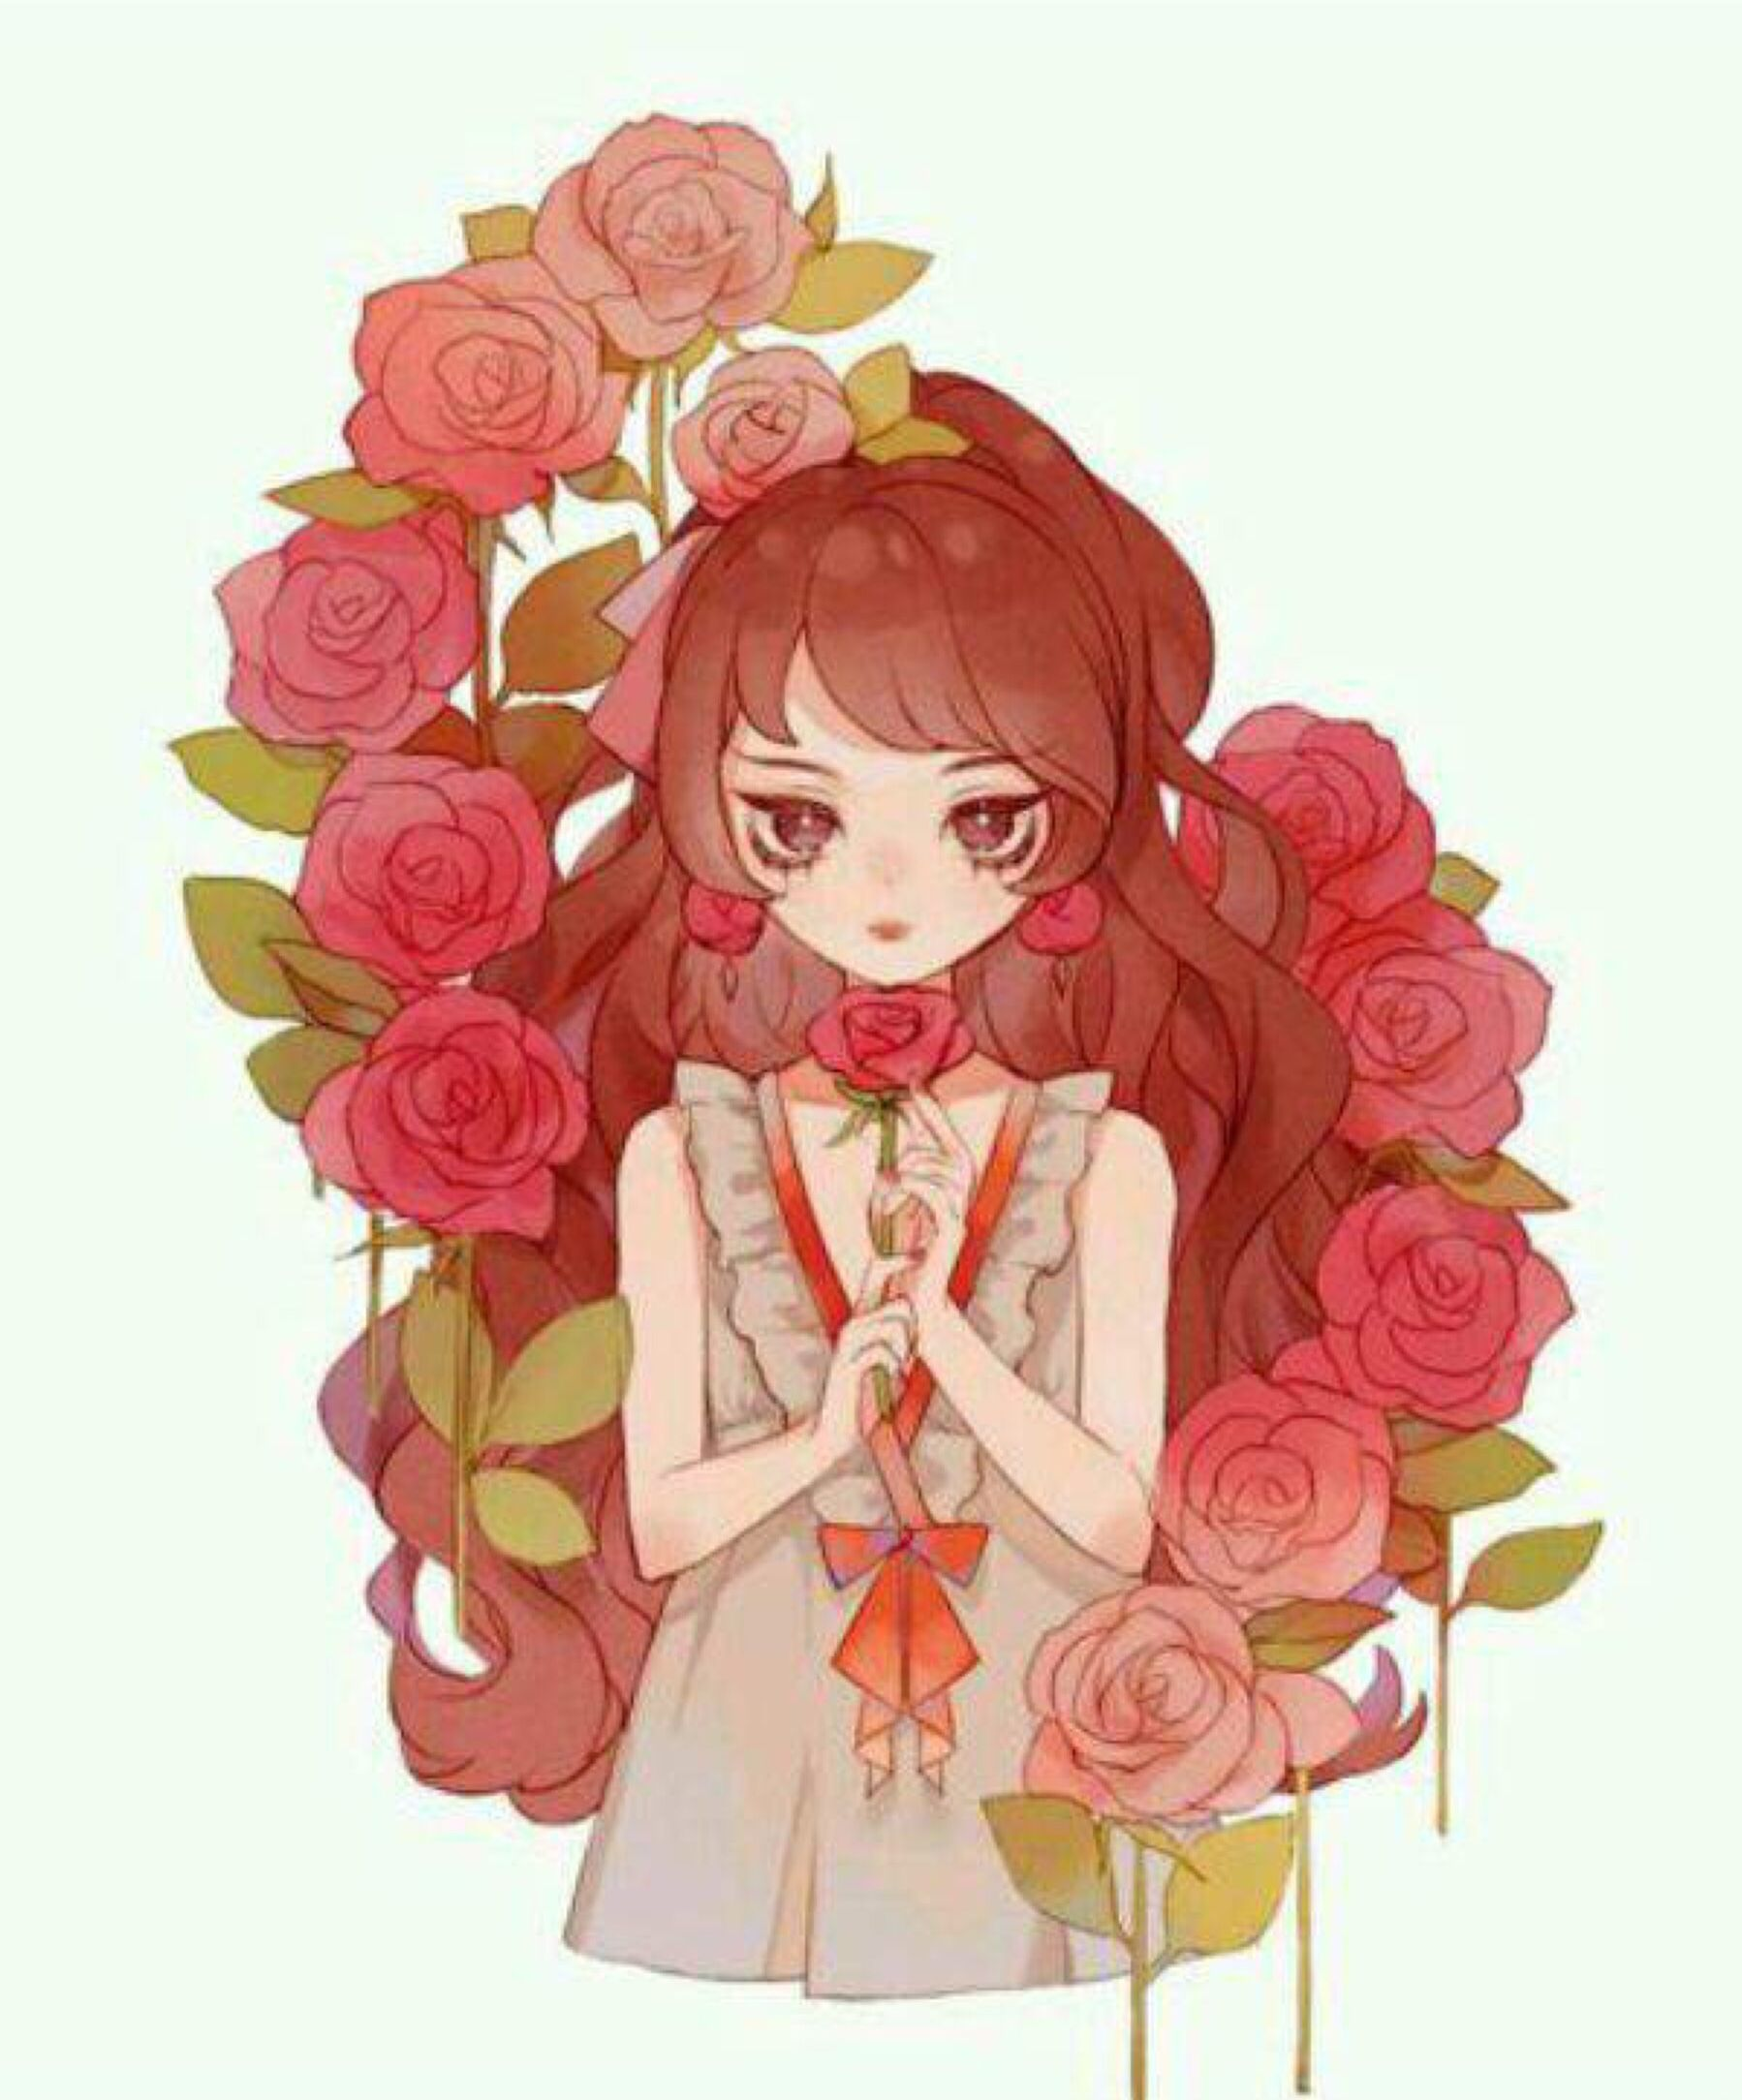 Pin by 𝗔𝗹𝗶𝗰𝗲੭. on Kawaii Anime  Anime flower, Anime art